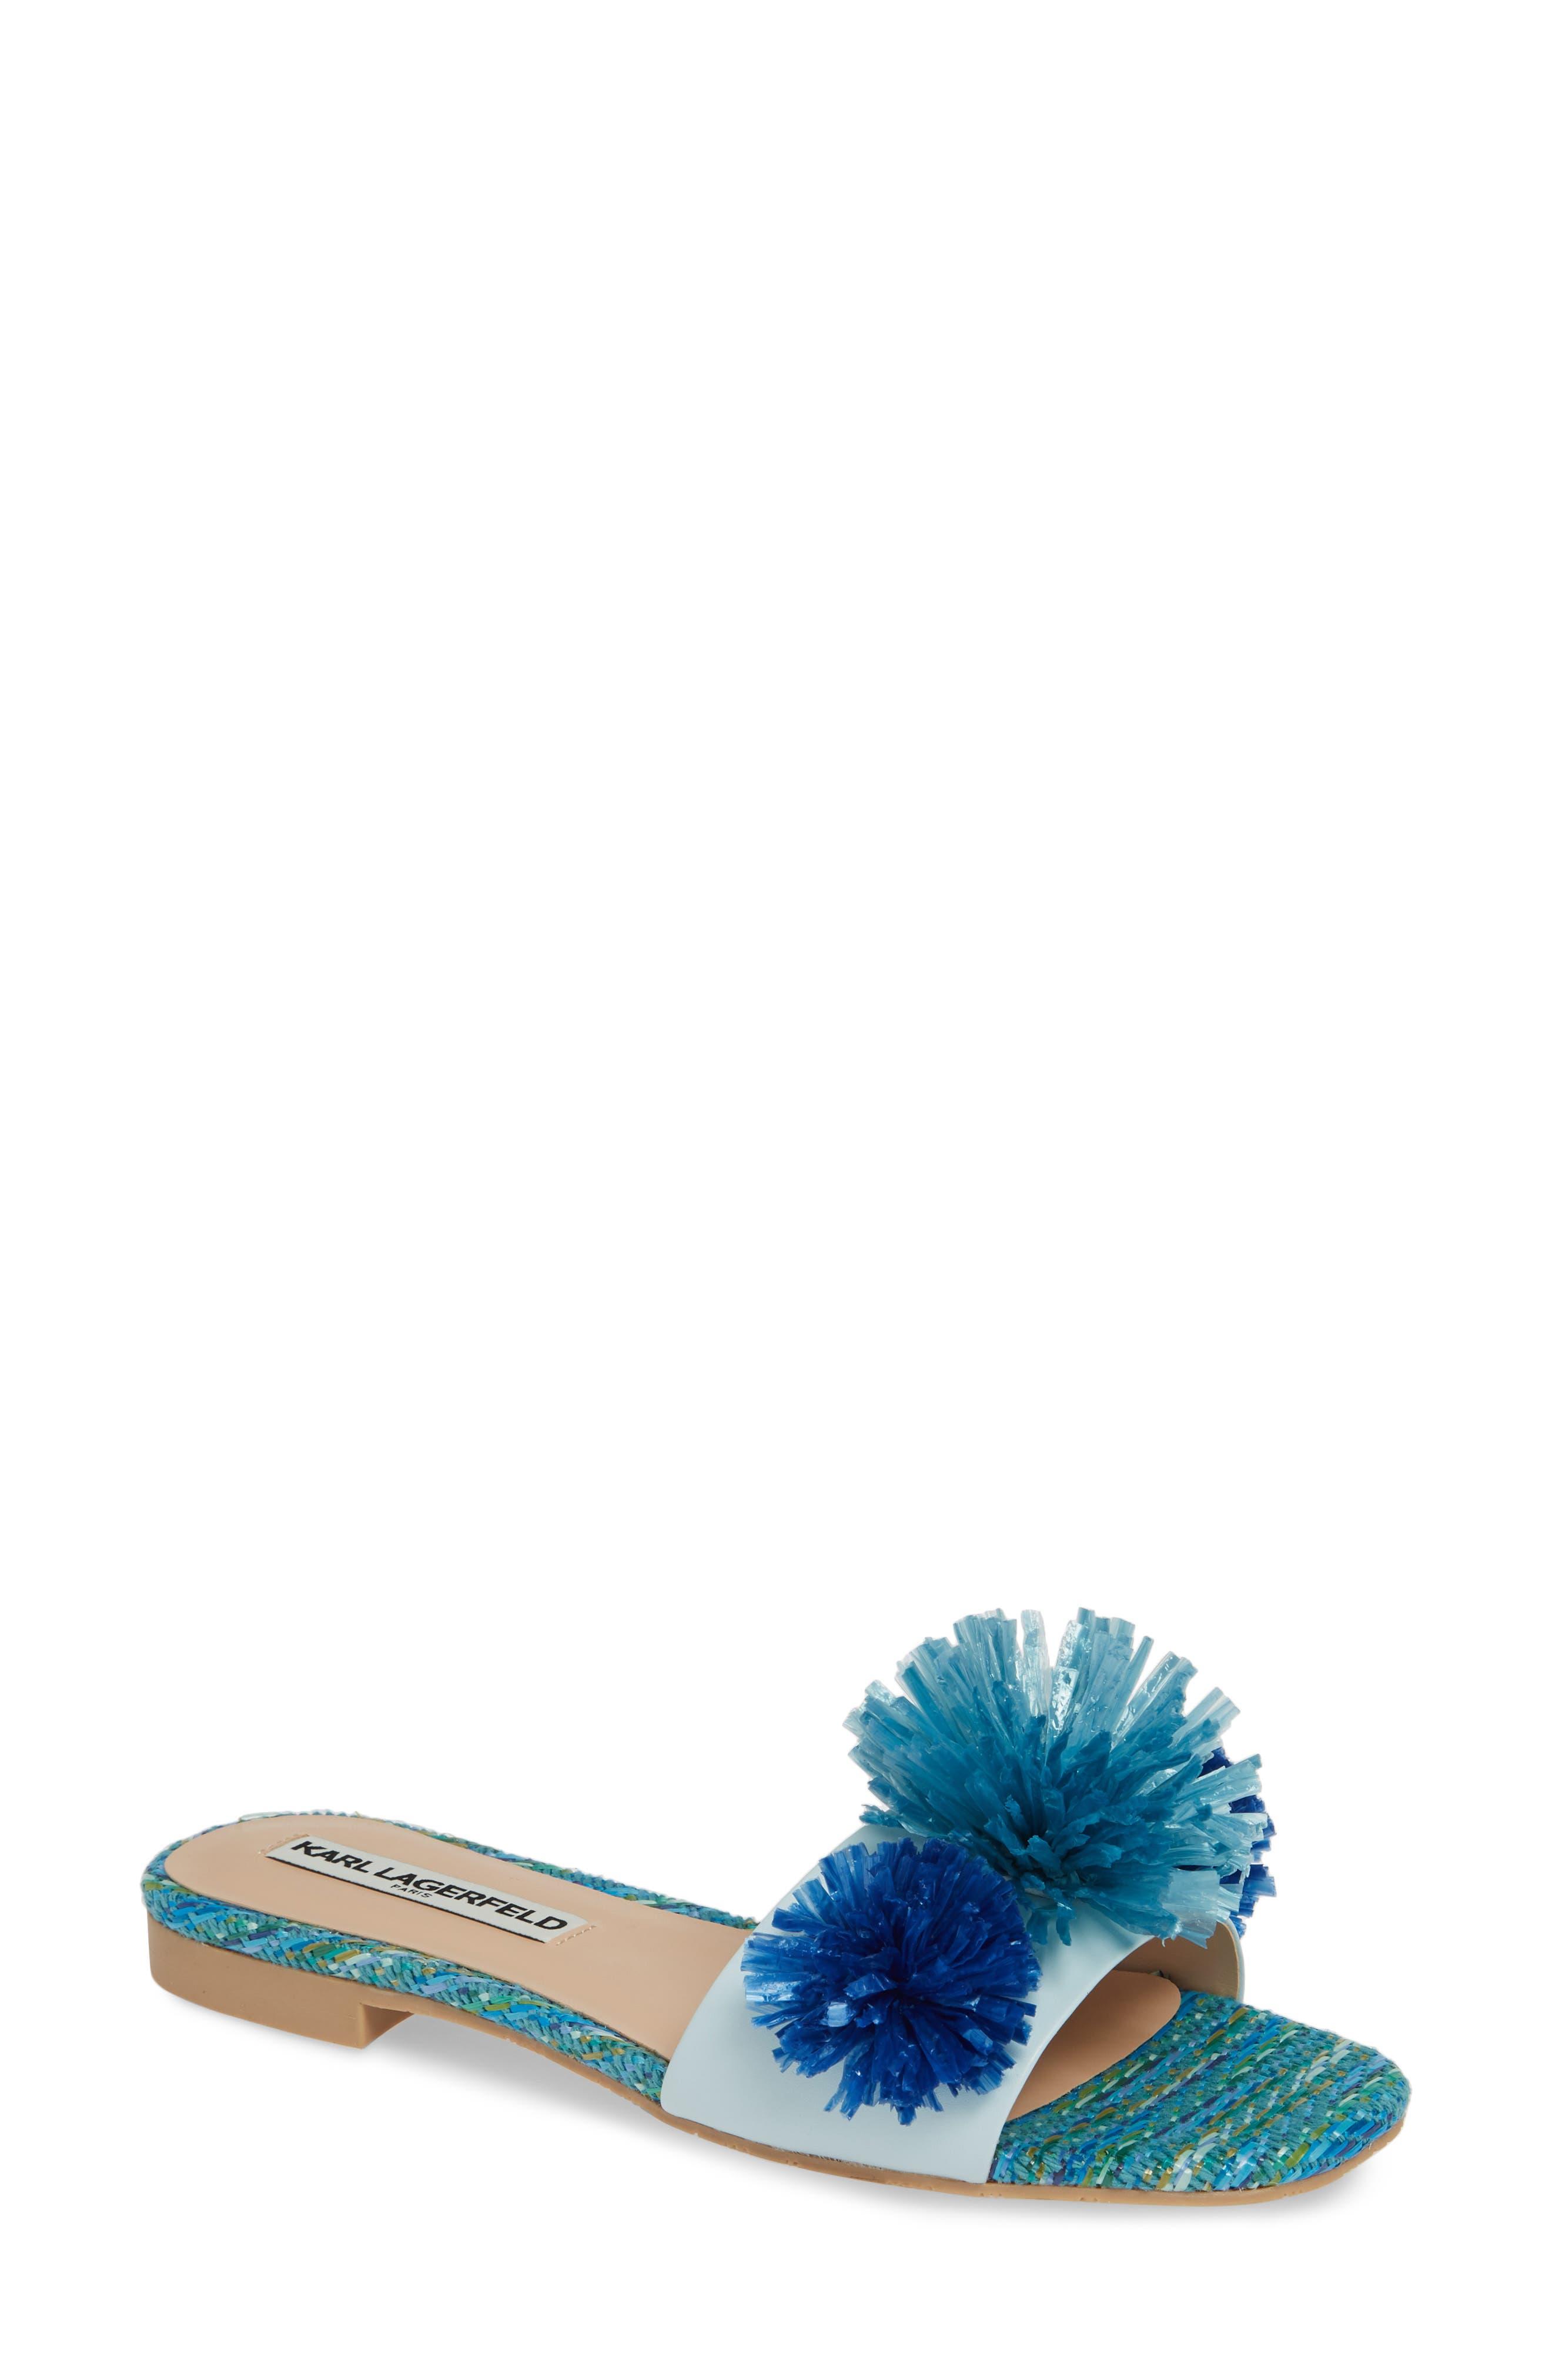 Karl Lagerfeld Paris Rainey Slide Sandal- Blue